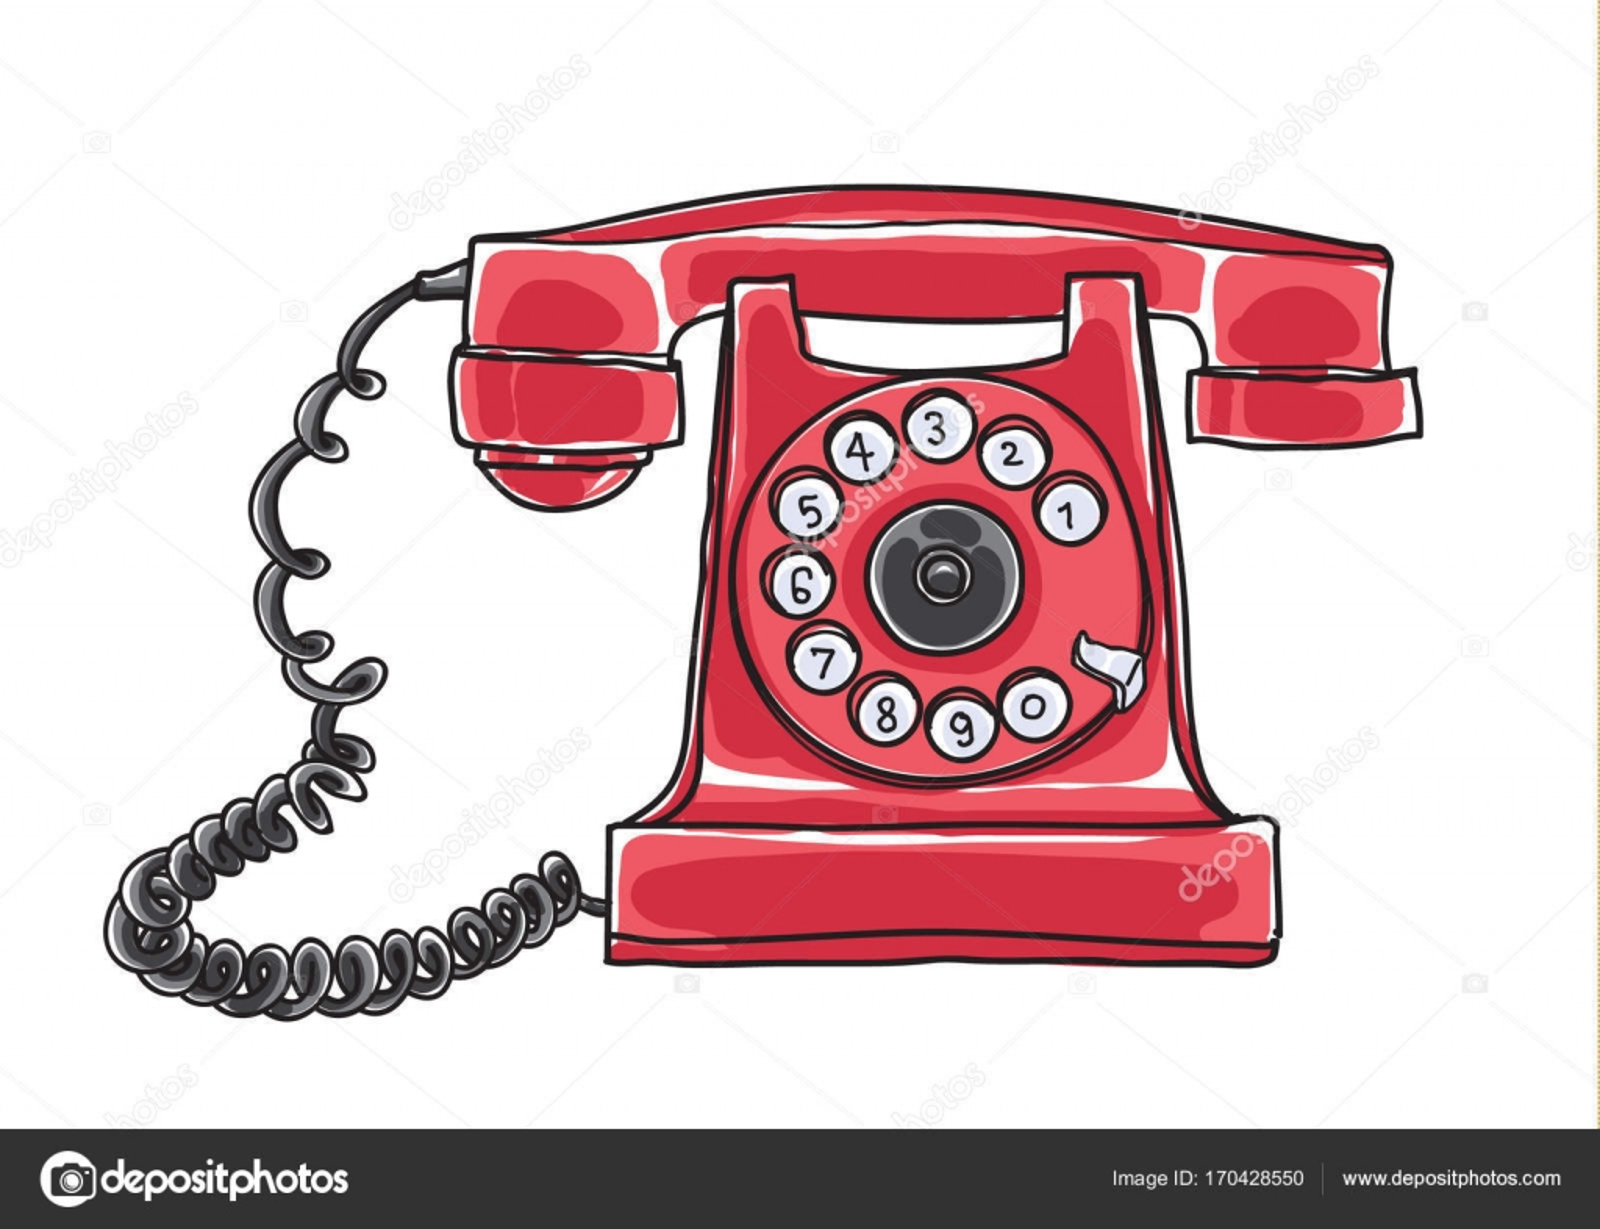 Imágenes Telefonos Antiguos Mano De Antiguos Rotary Teléfono Rojo